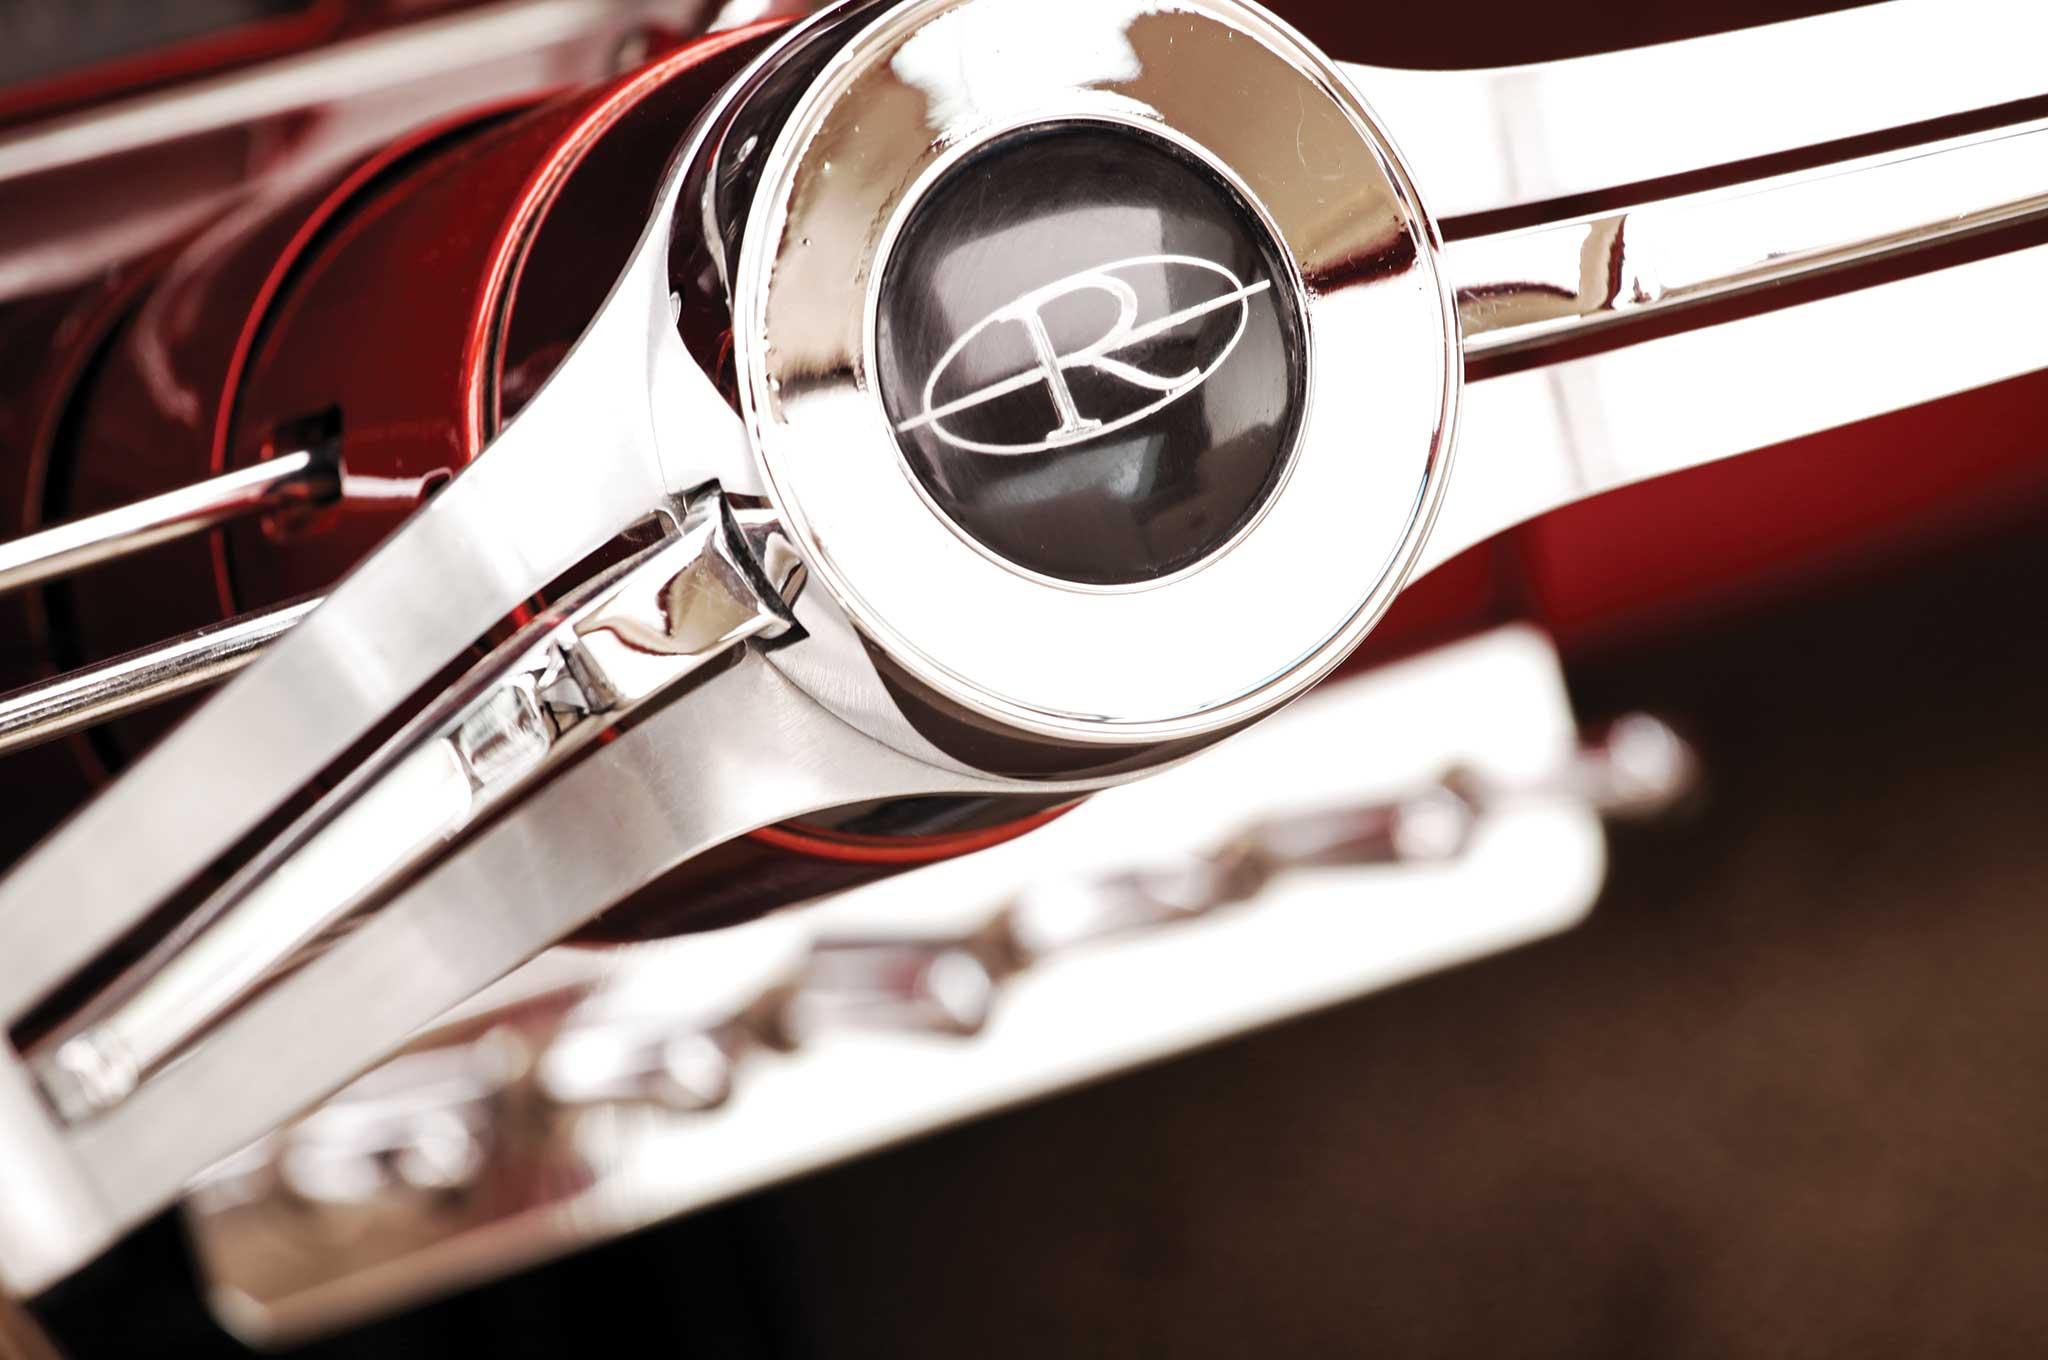 1967 buick riviera steering wheel 011